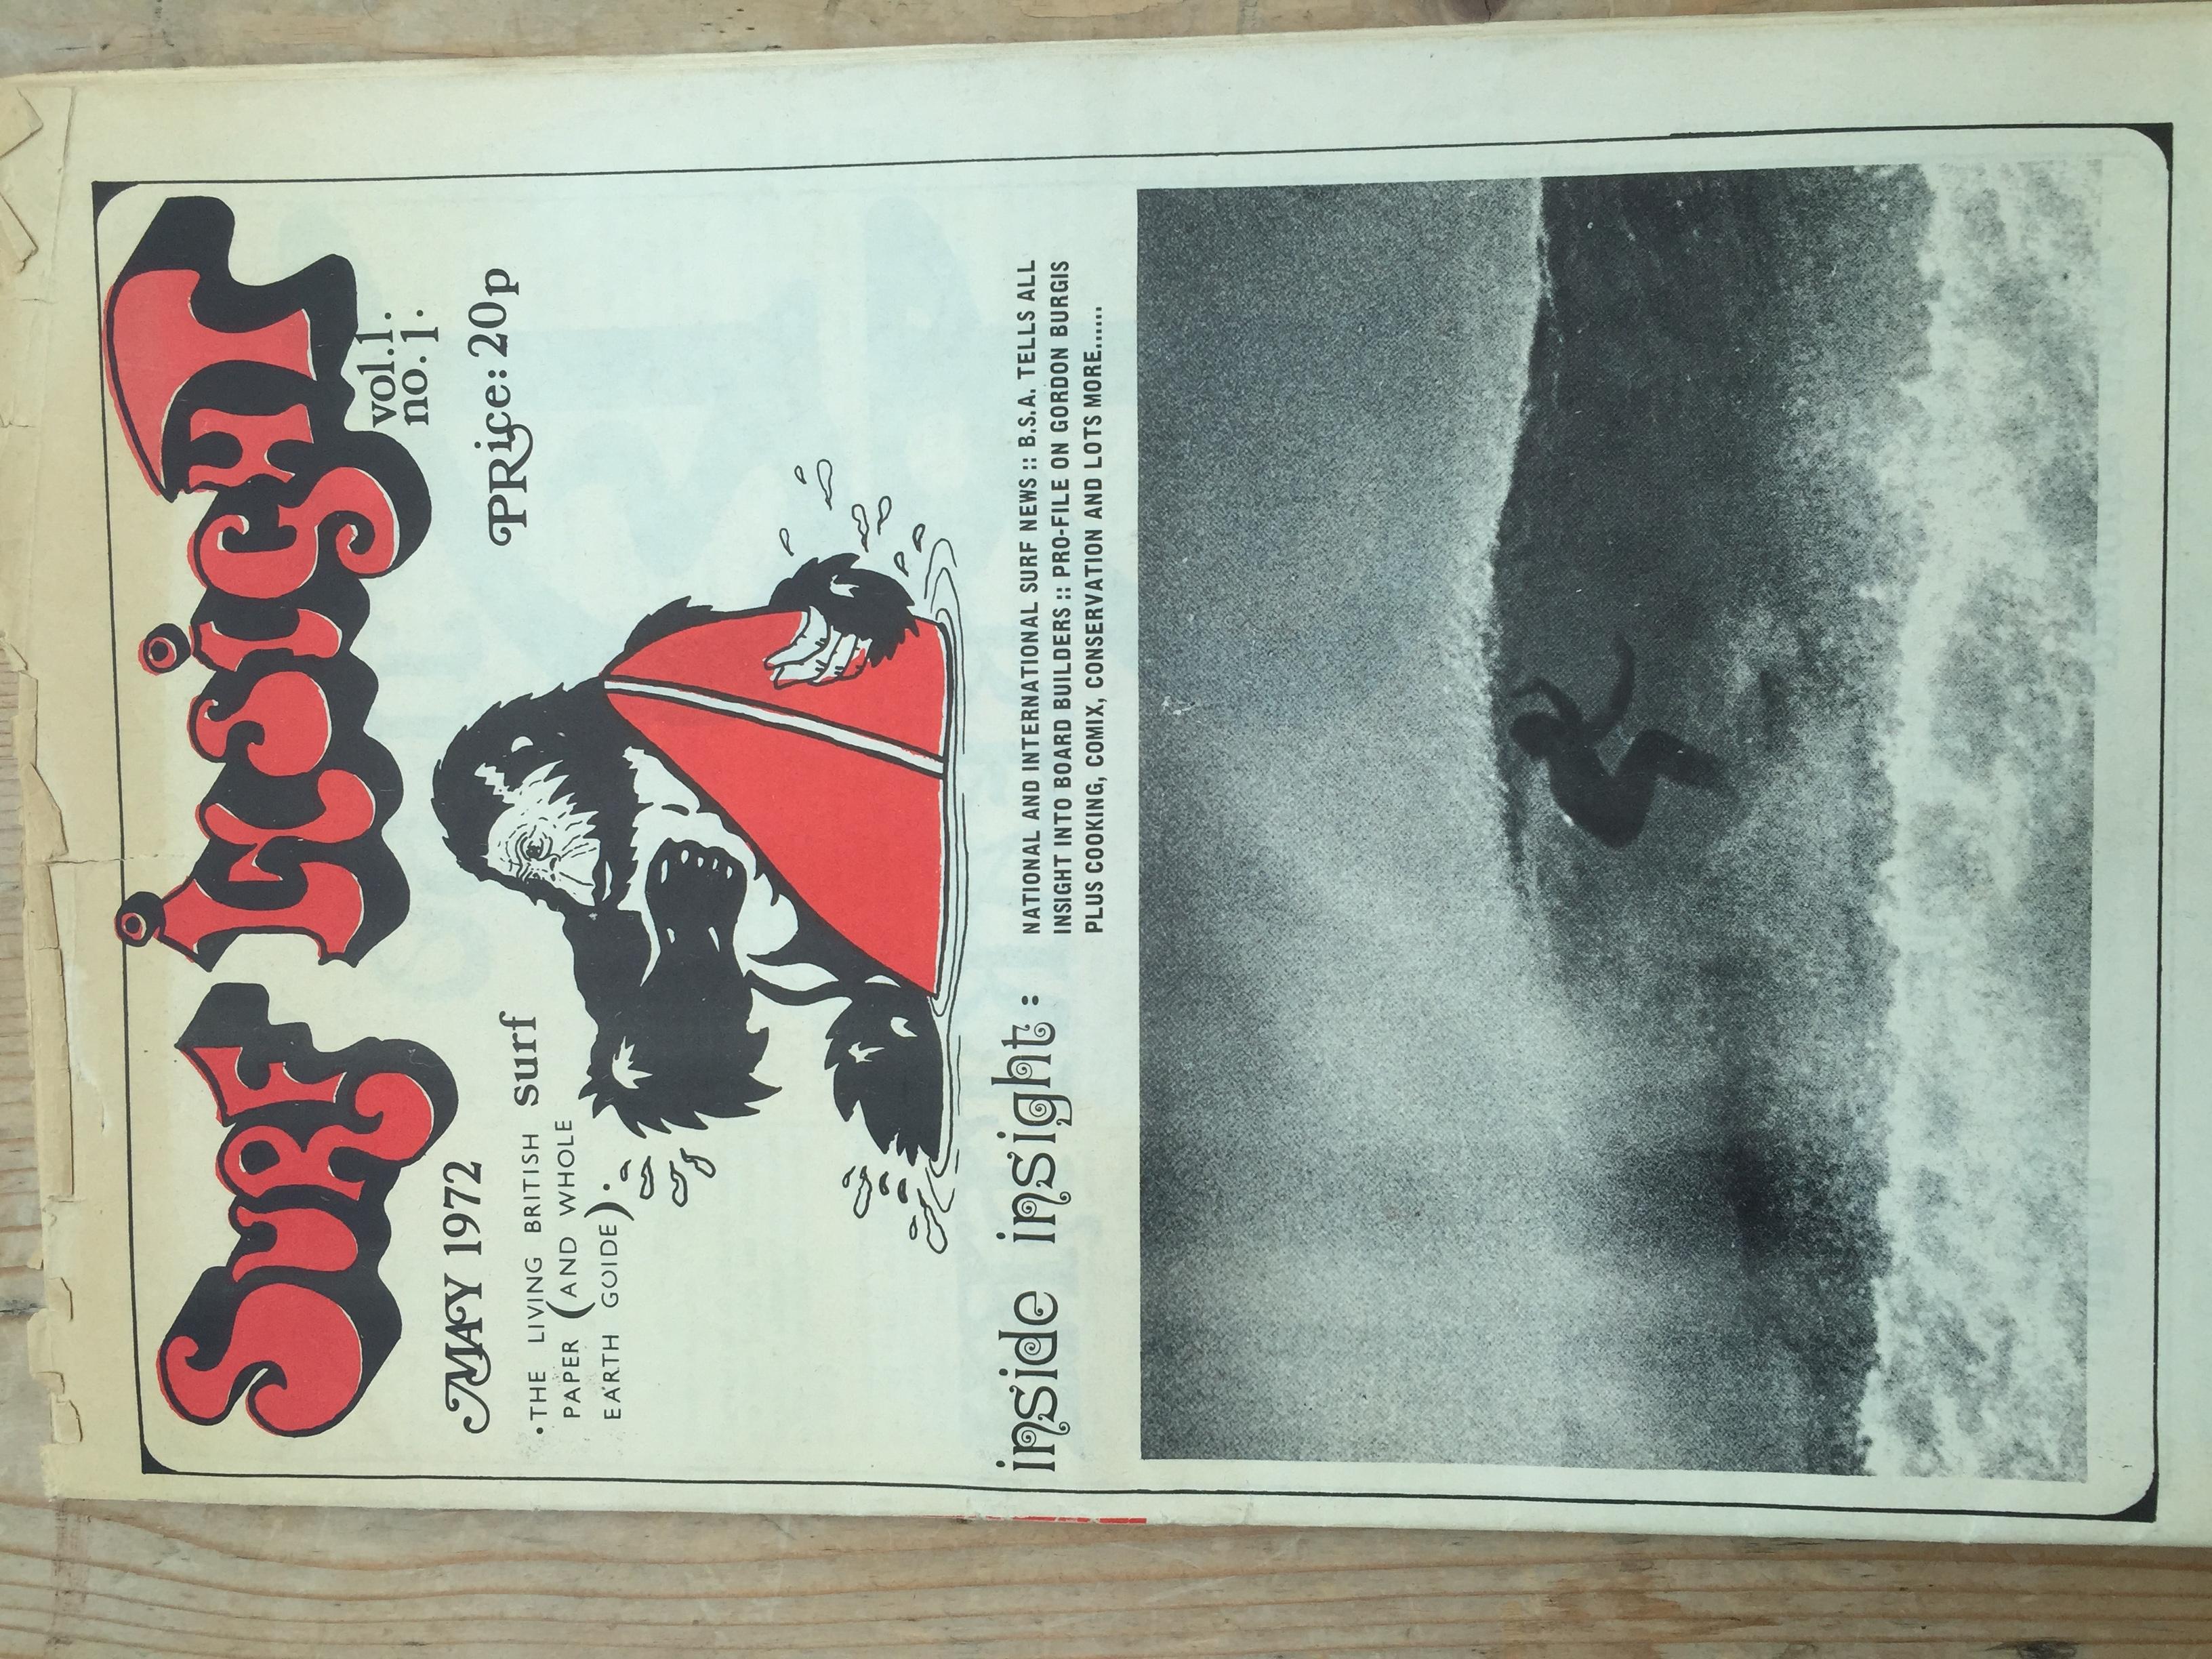 Surf Insight magazine